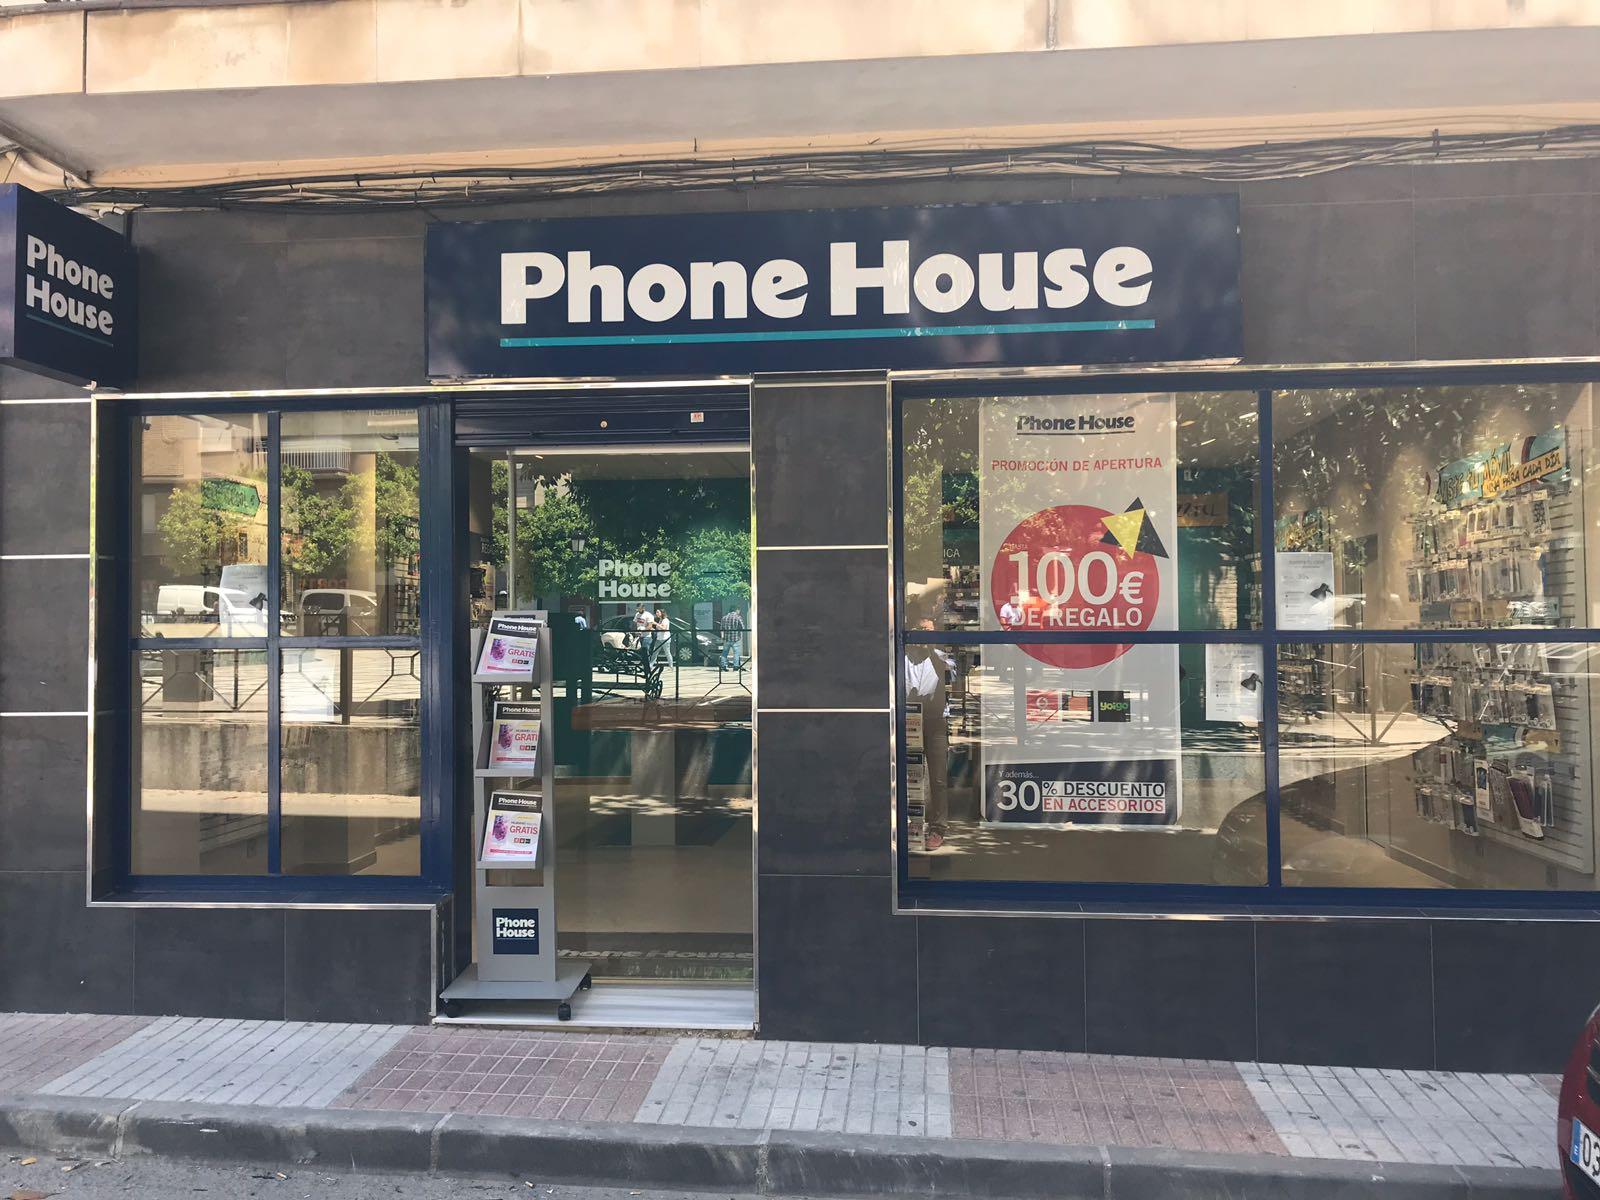 Tienda Phone House en Bailén (Jaén)